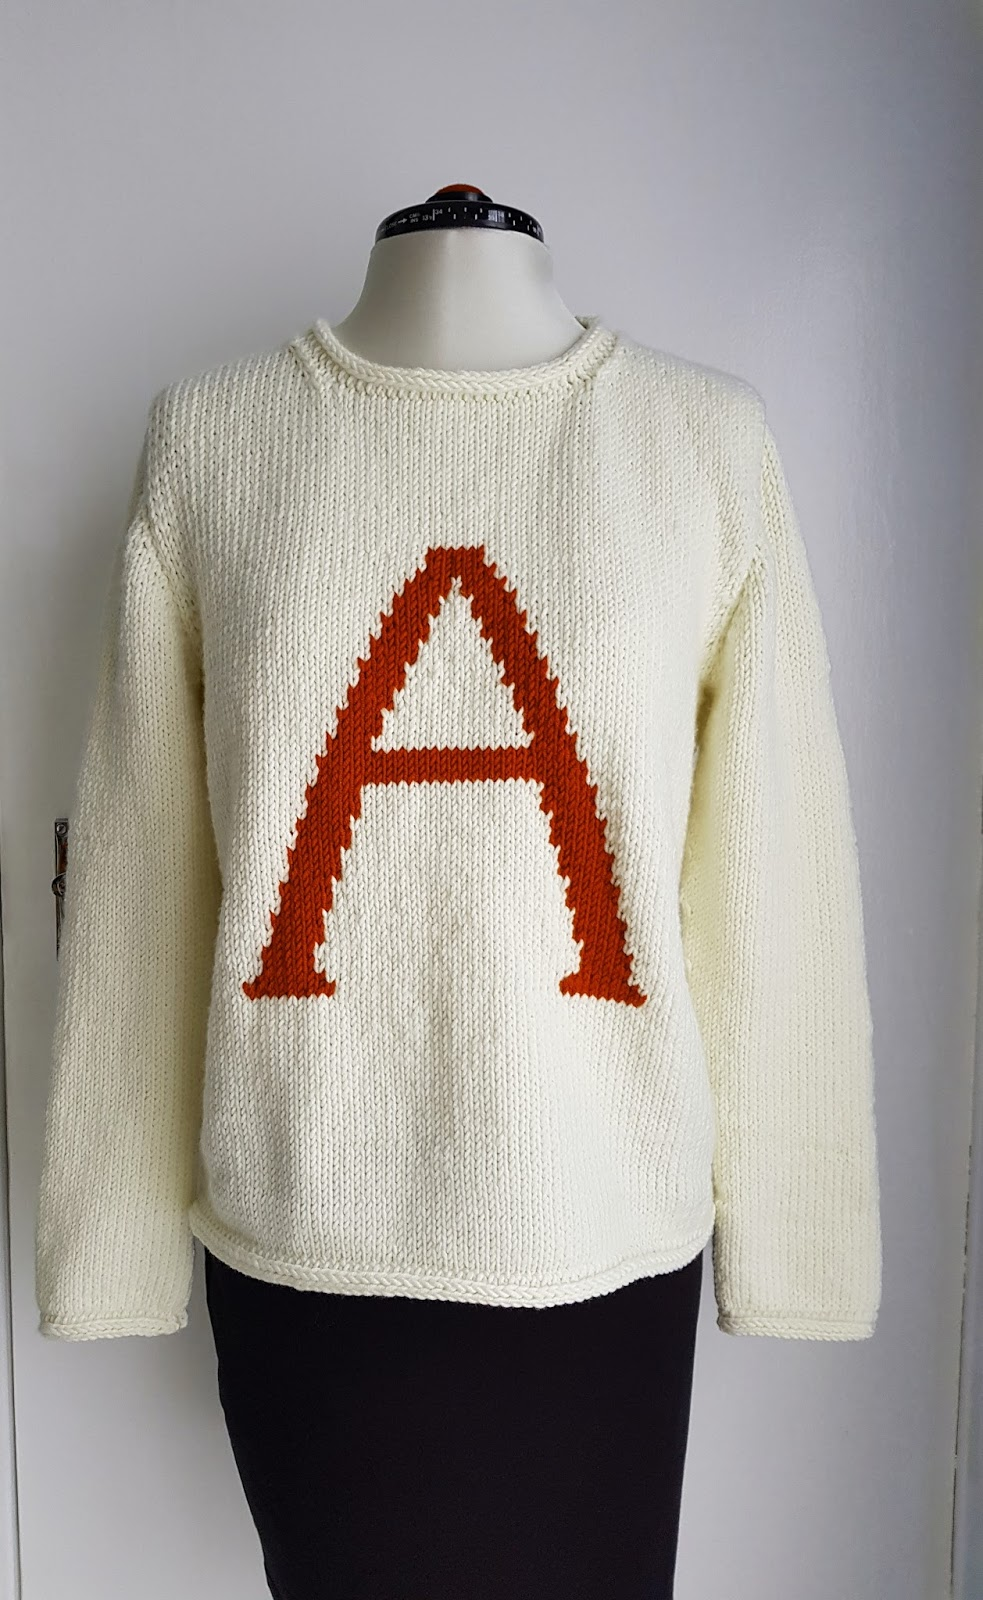 libra knits and sews: January 2018